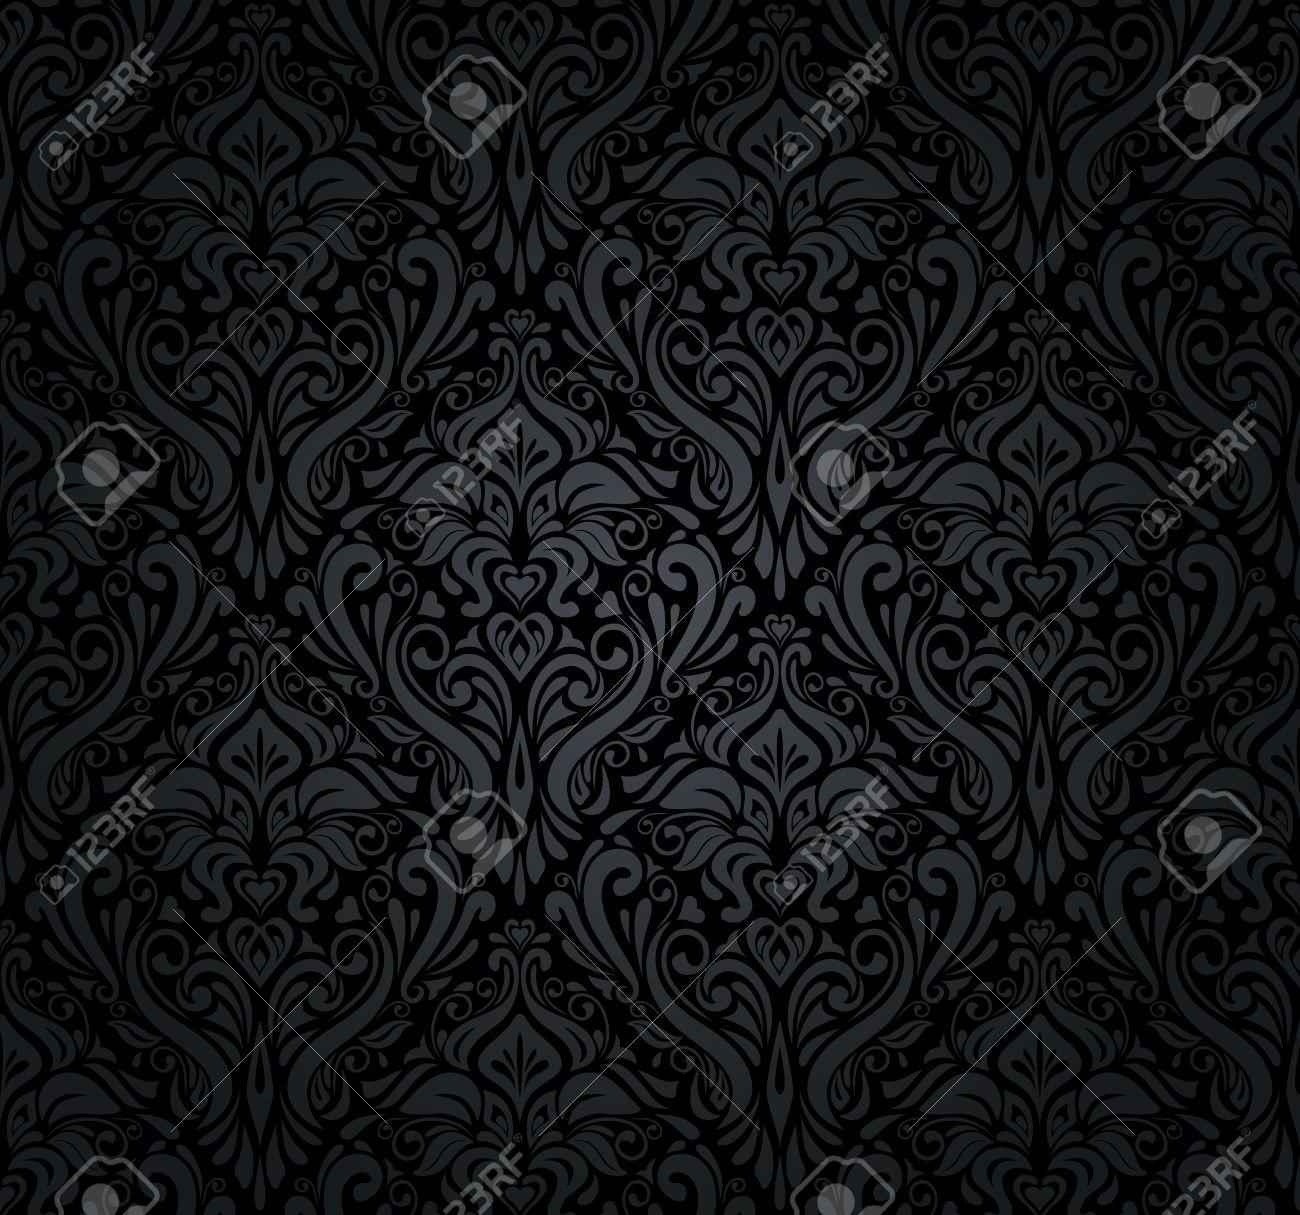 black vintage wallpaper royalty free cliparts, vectors, and stock